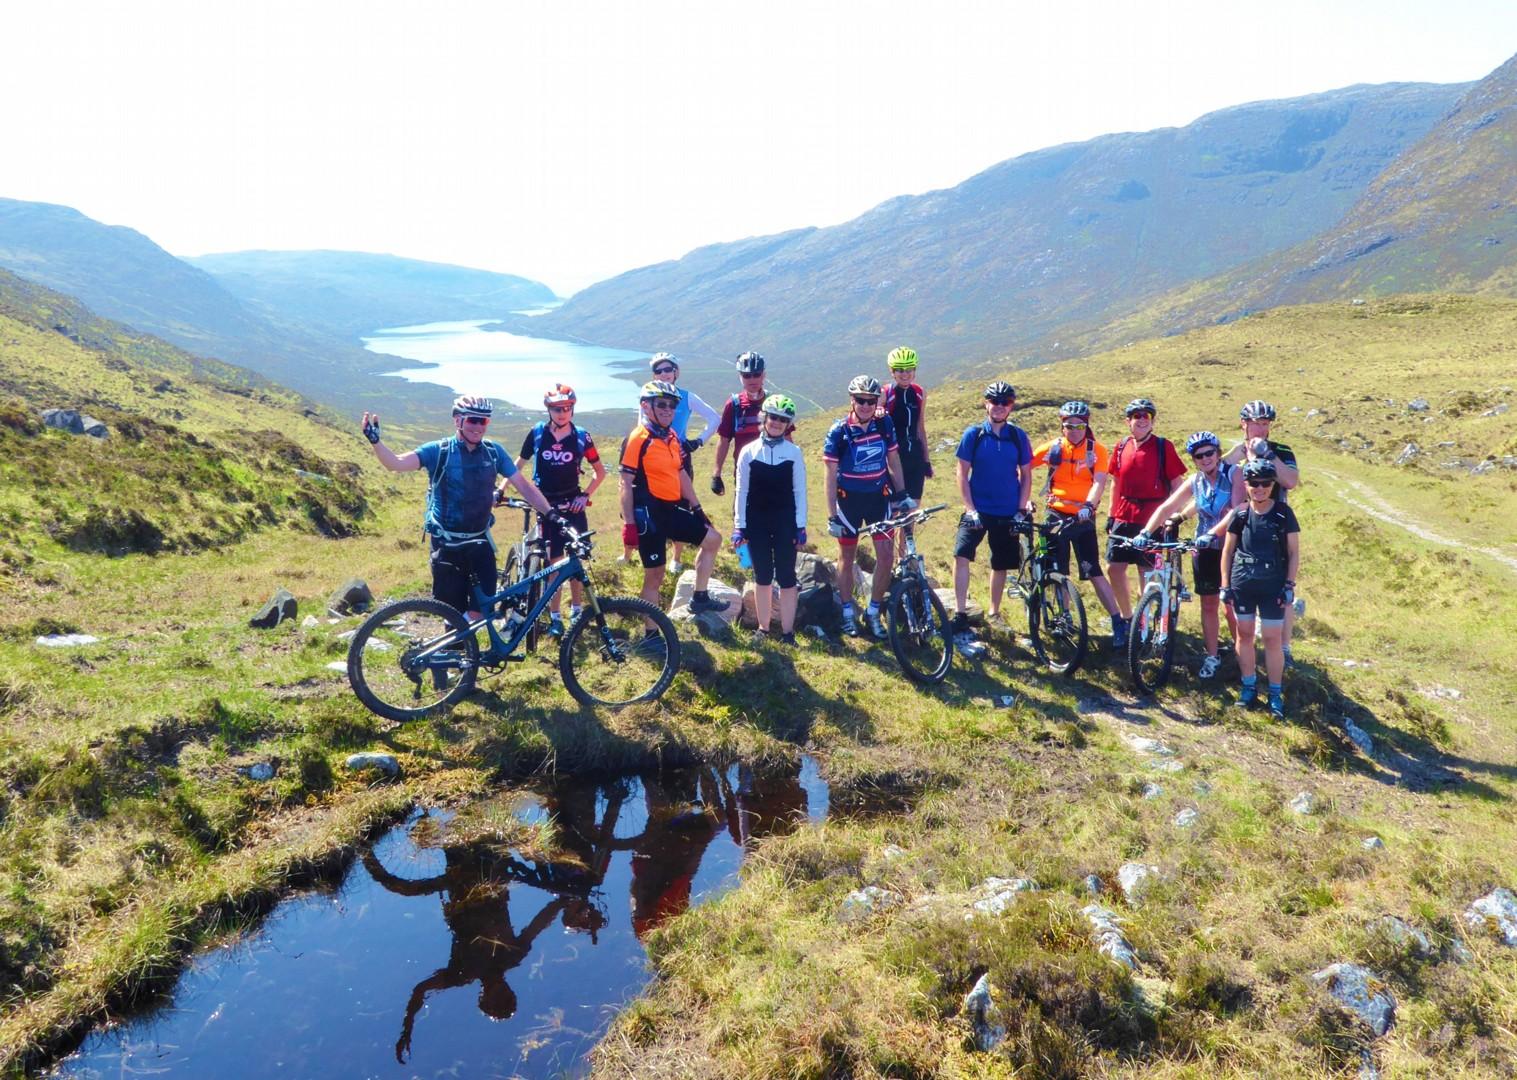 group-mountain-biking-guided-holiday-in-outer-hebrides-scotland.jpg - Scotland - Hebridean Explorer - Guided Mountain Bike Holiday - Mountain Biking